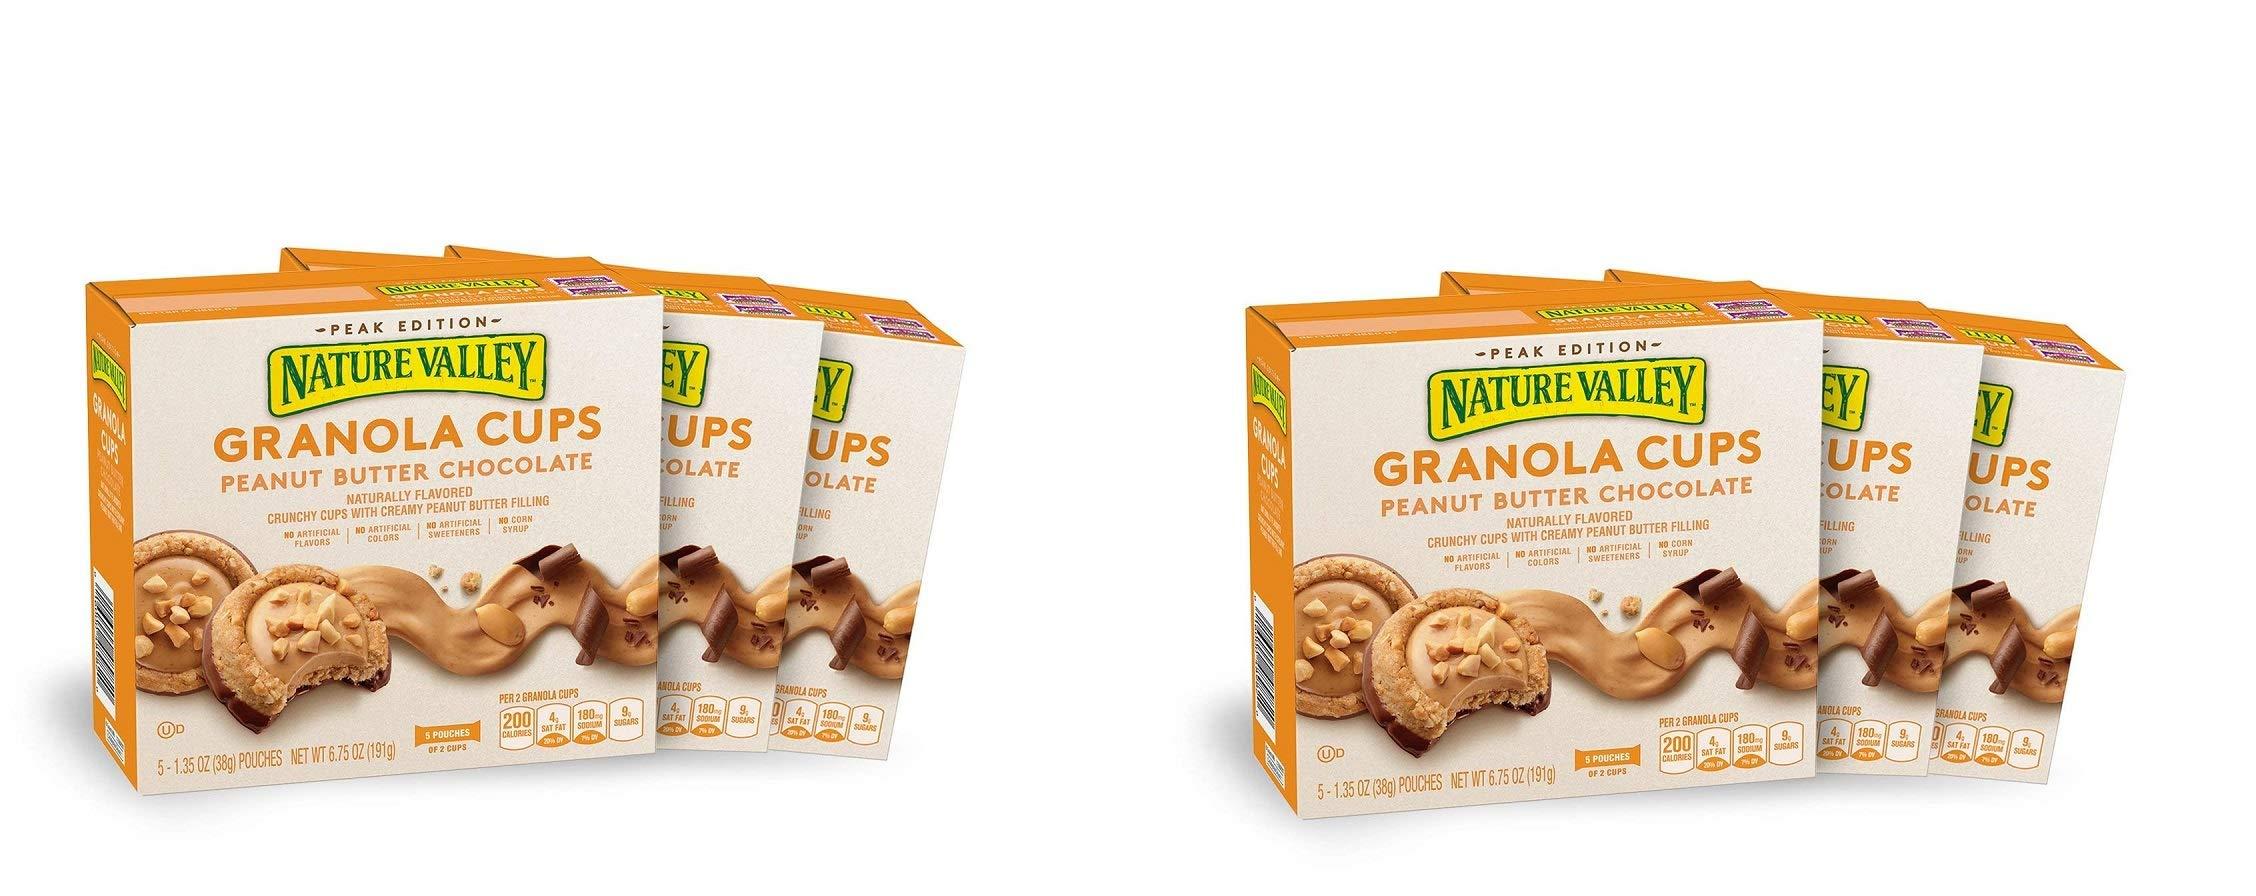 Nature Valley Peak Edition Granola Cups, Peanut Butter, 5 Pouches, 1.2 oz, (6 Boxes)